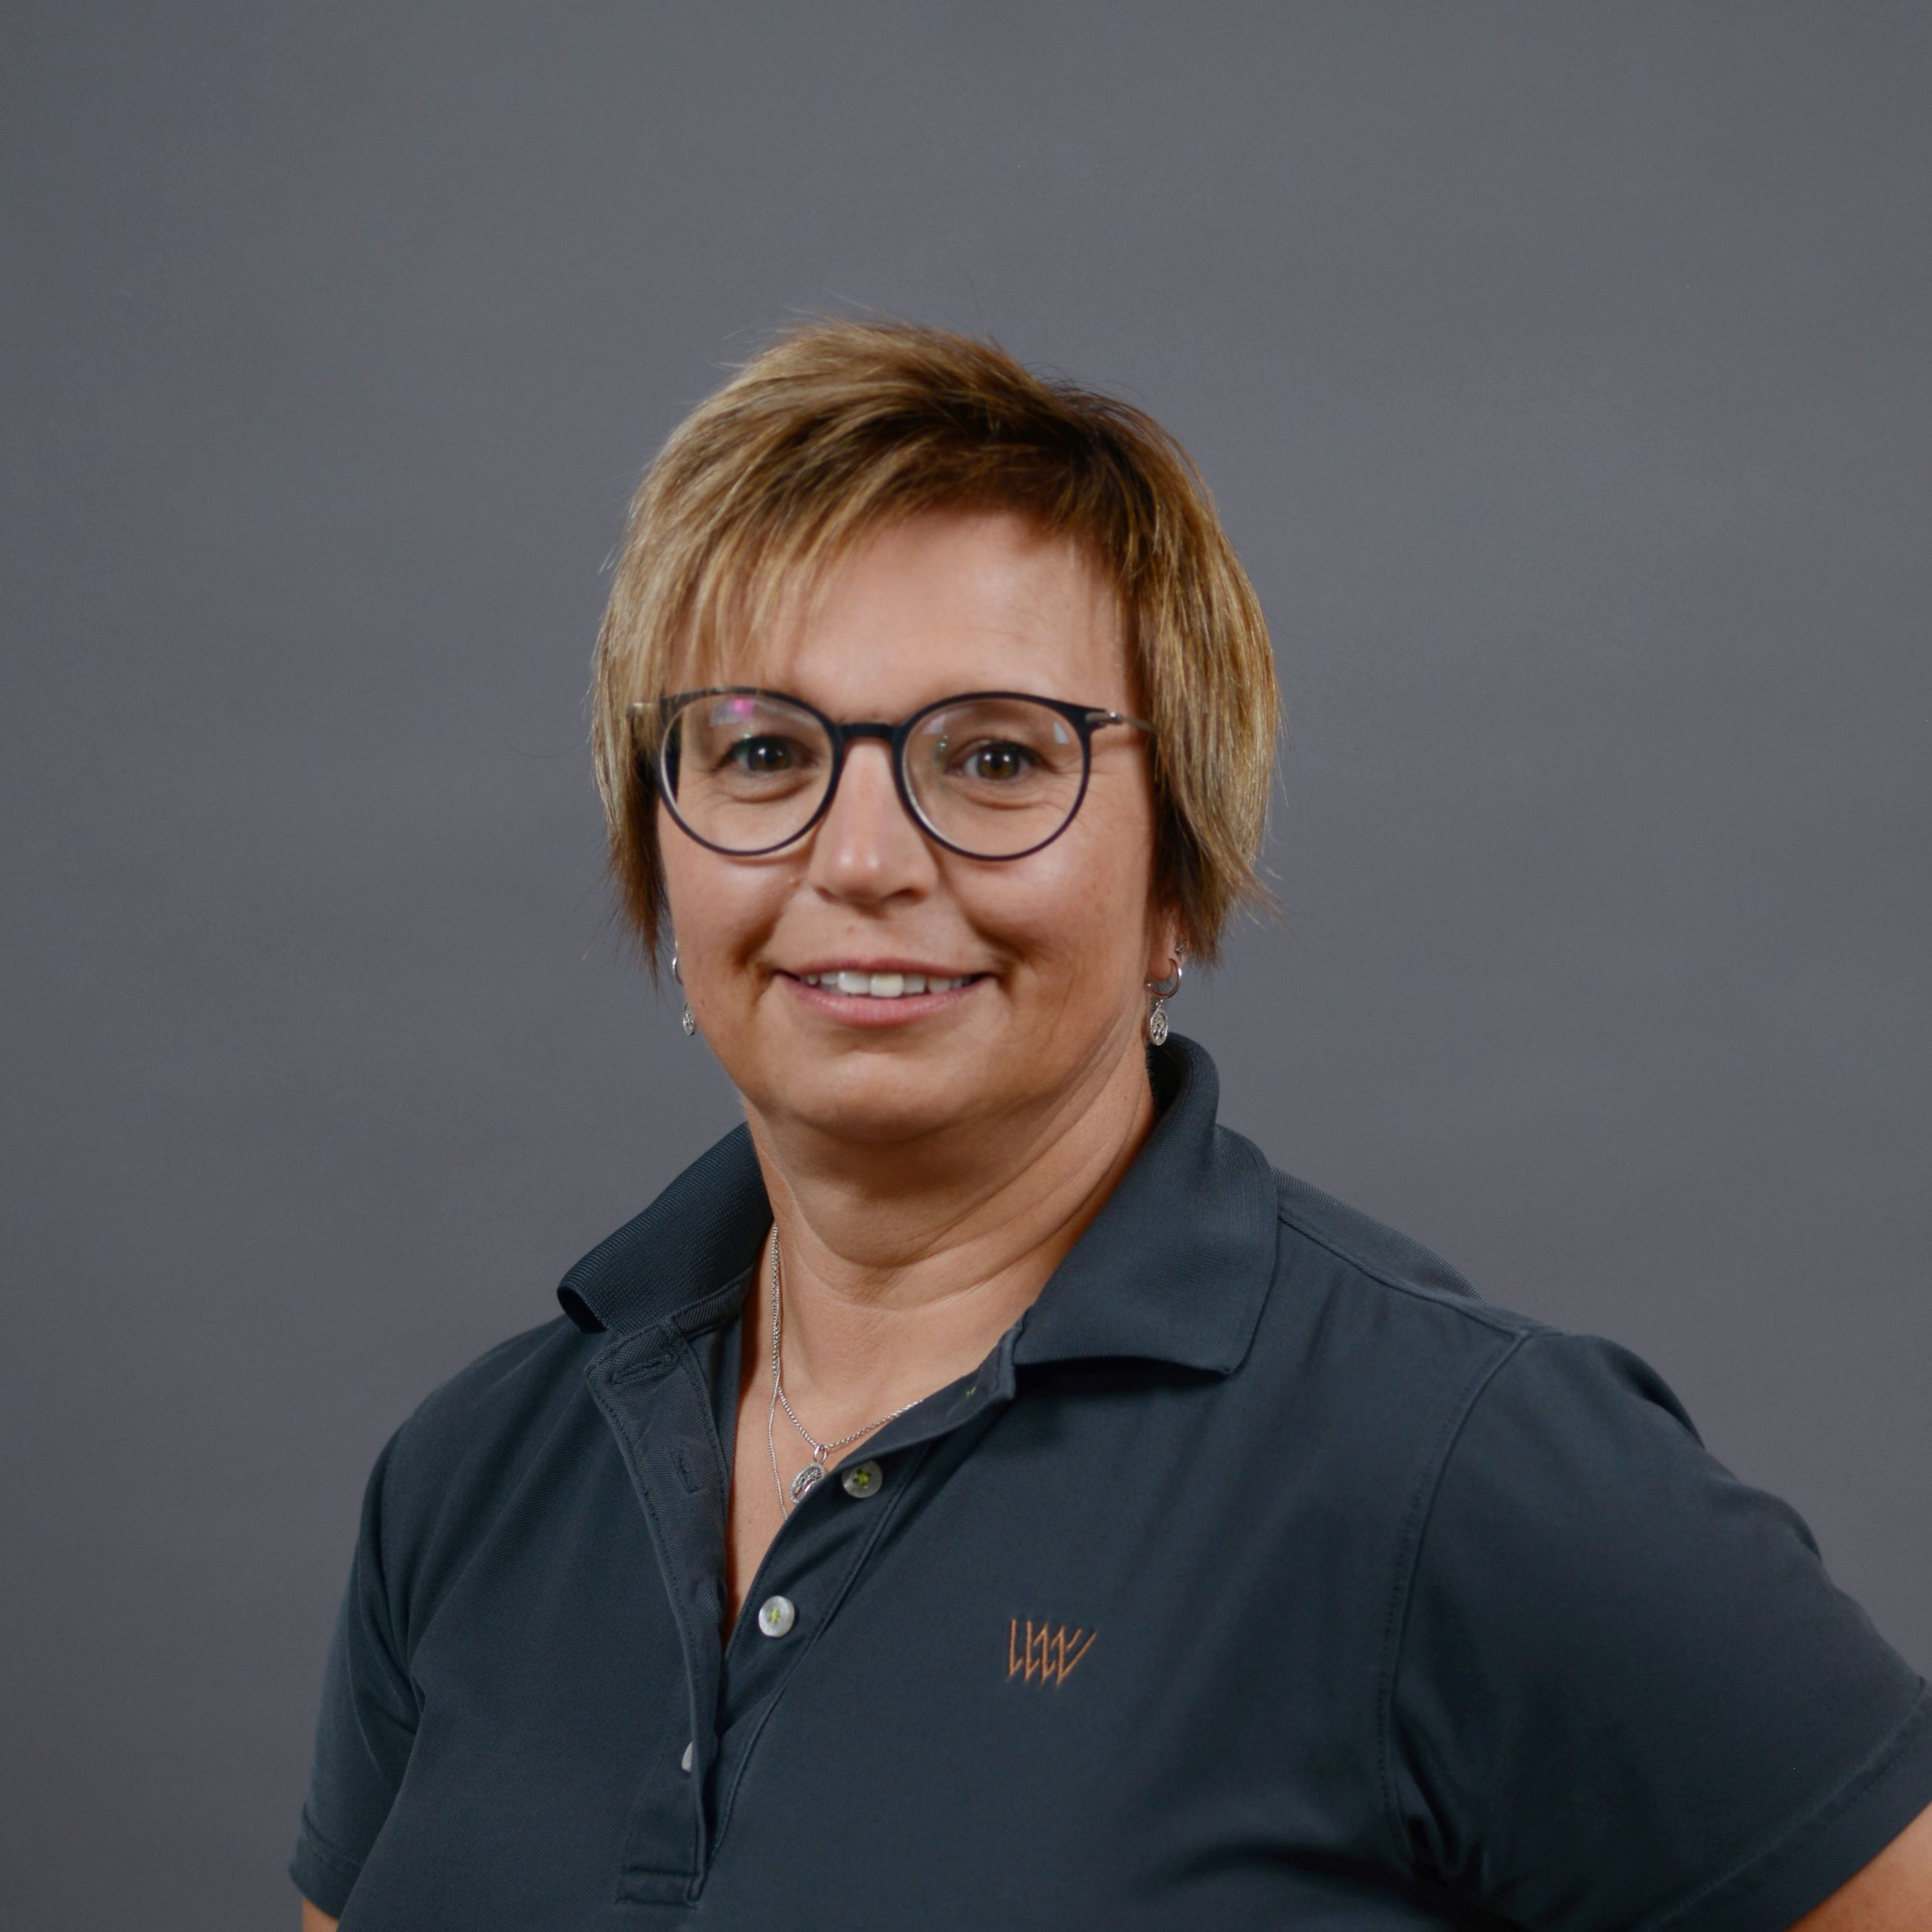 Margit Käser